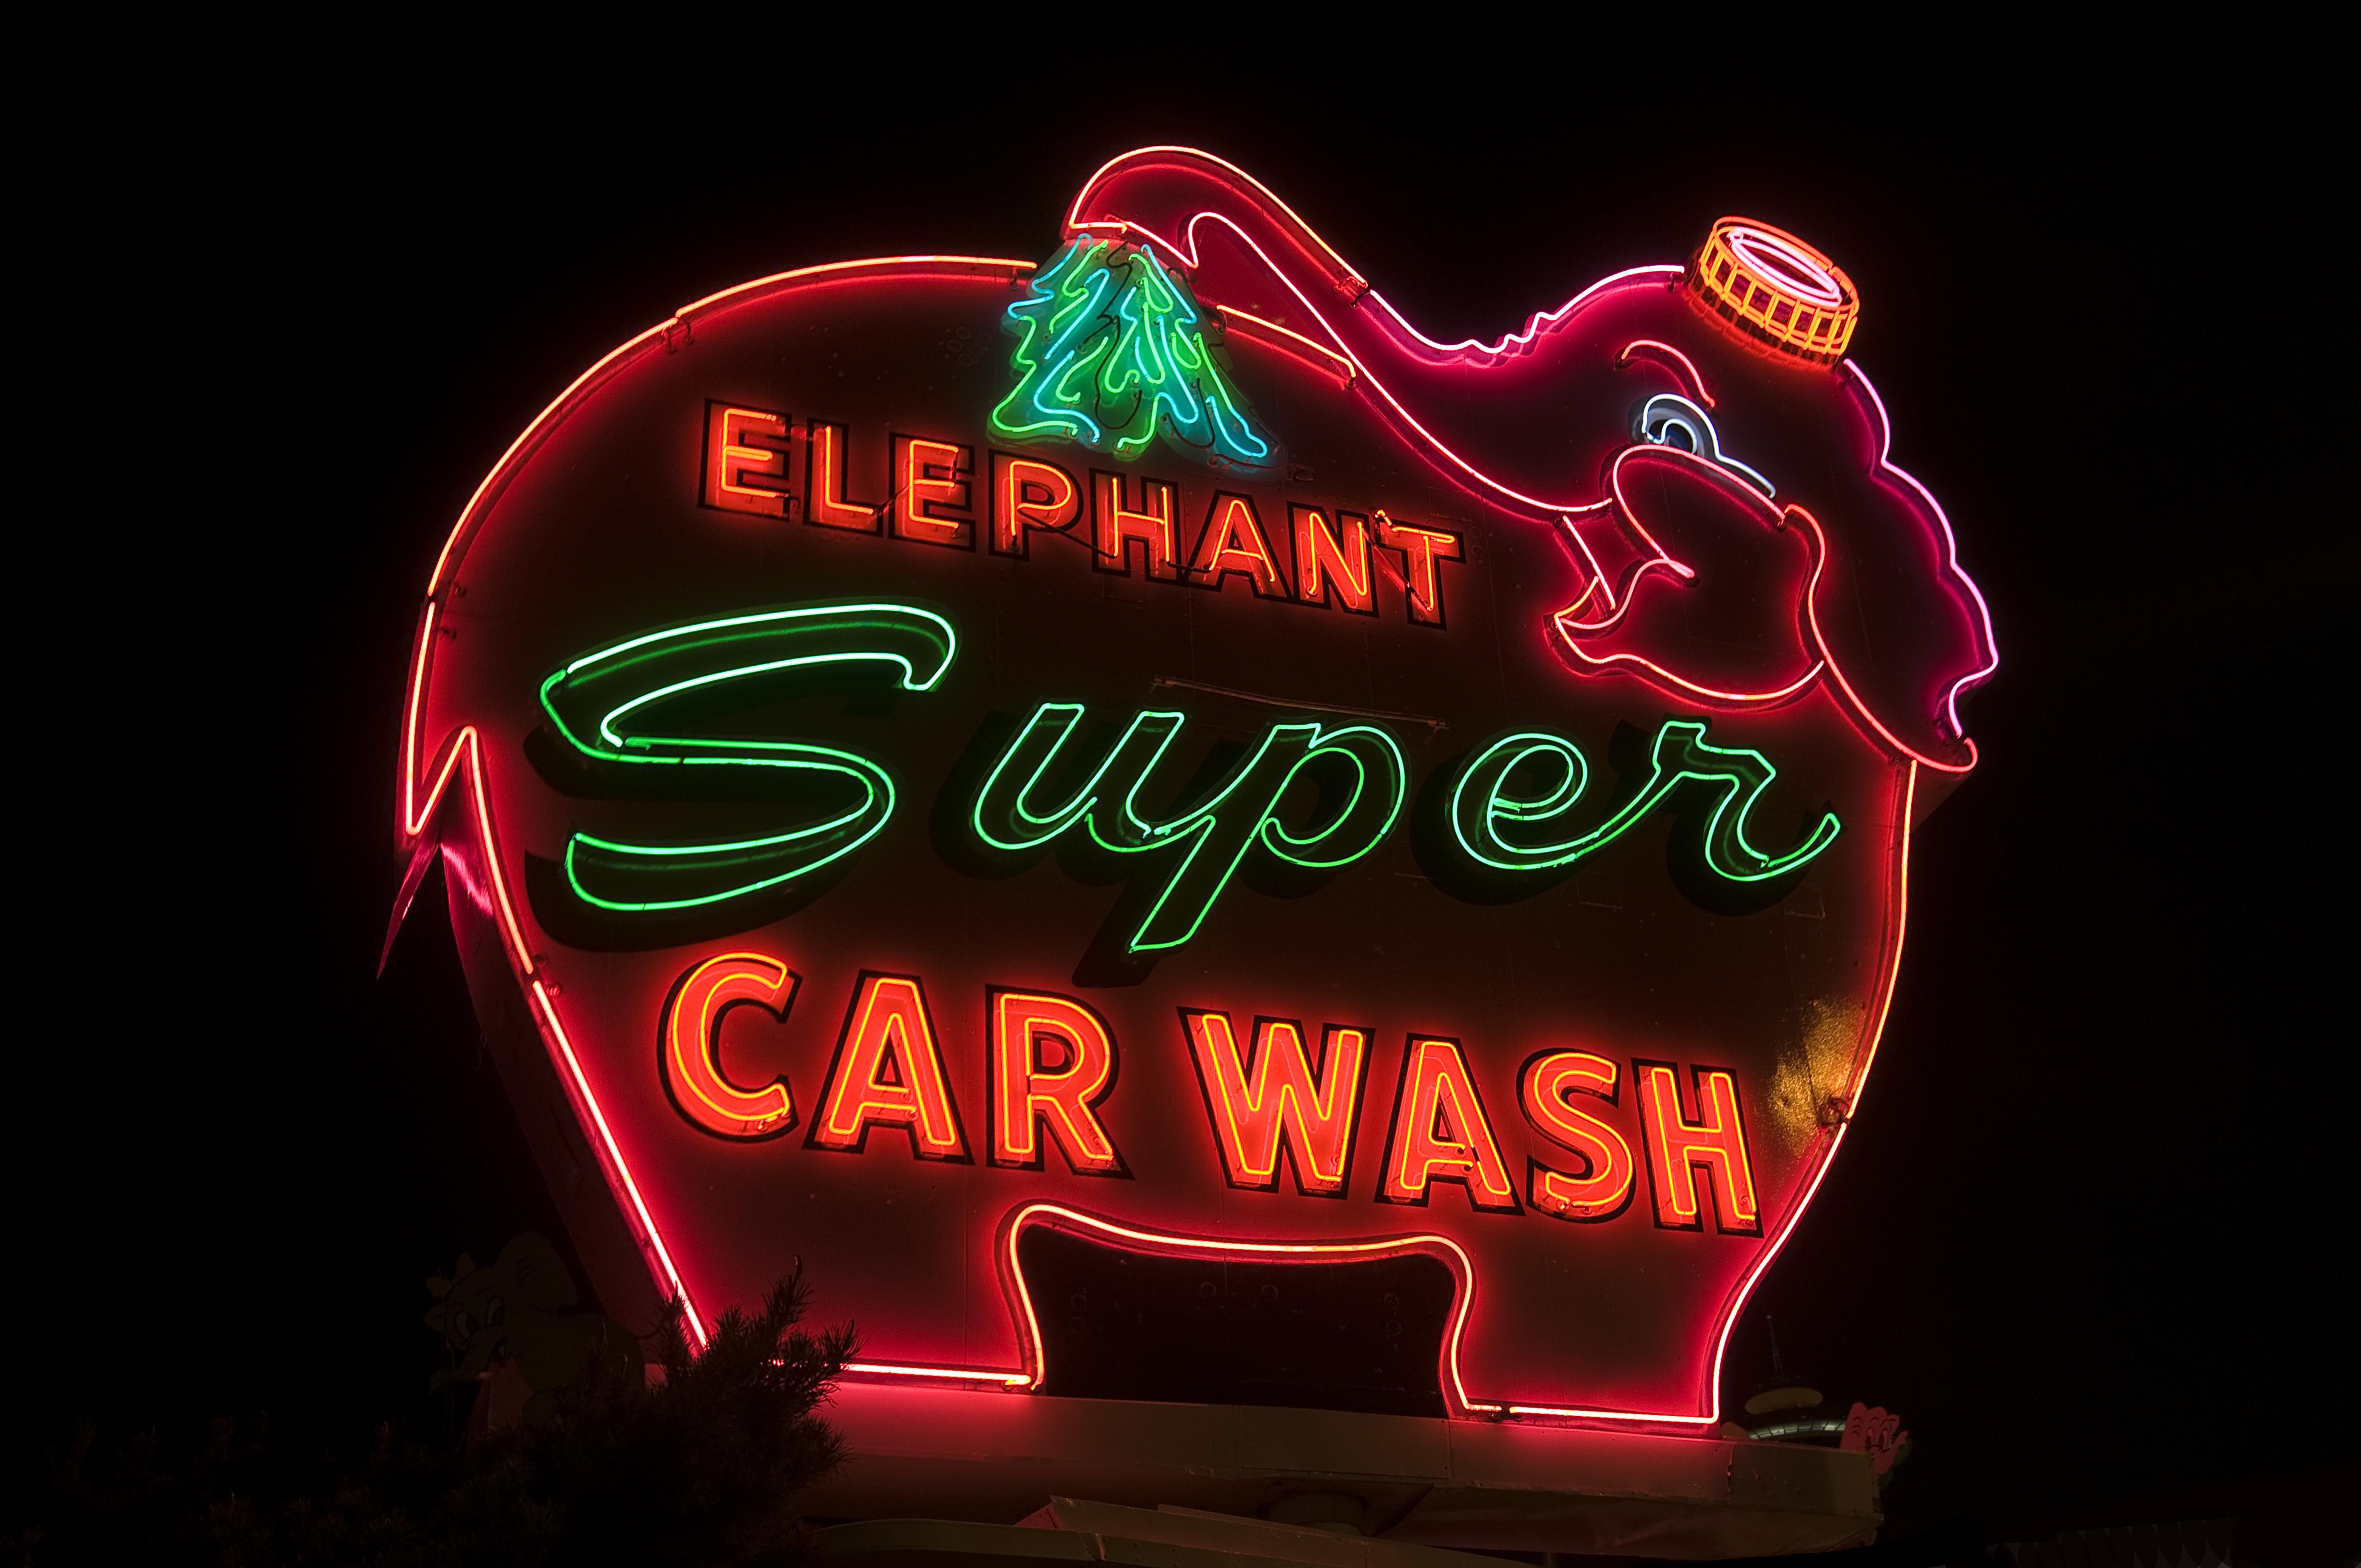 Elephant Super Car Wash - 616 Battery Street, Seattle, Washington U.S.A. - September 11, 2012